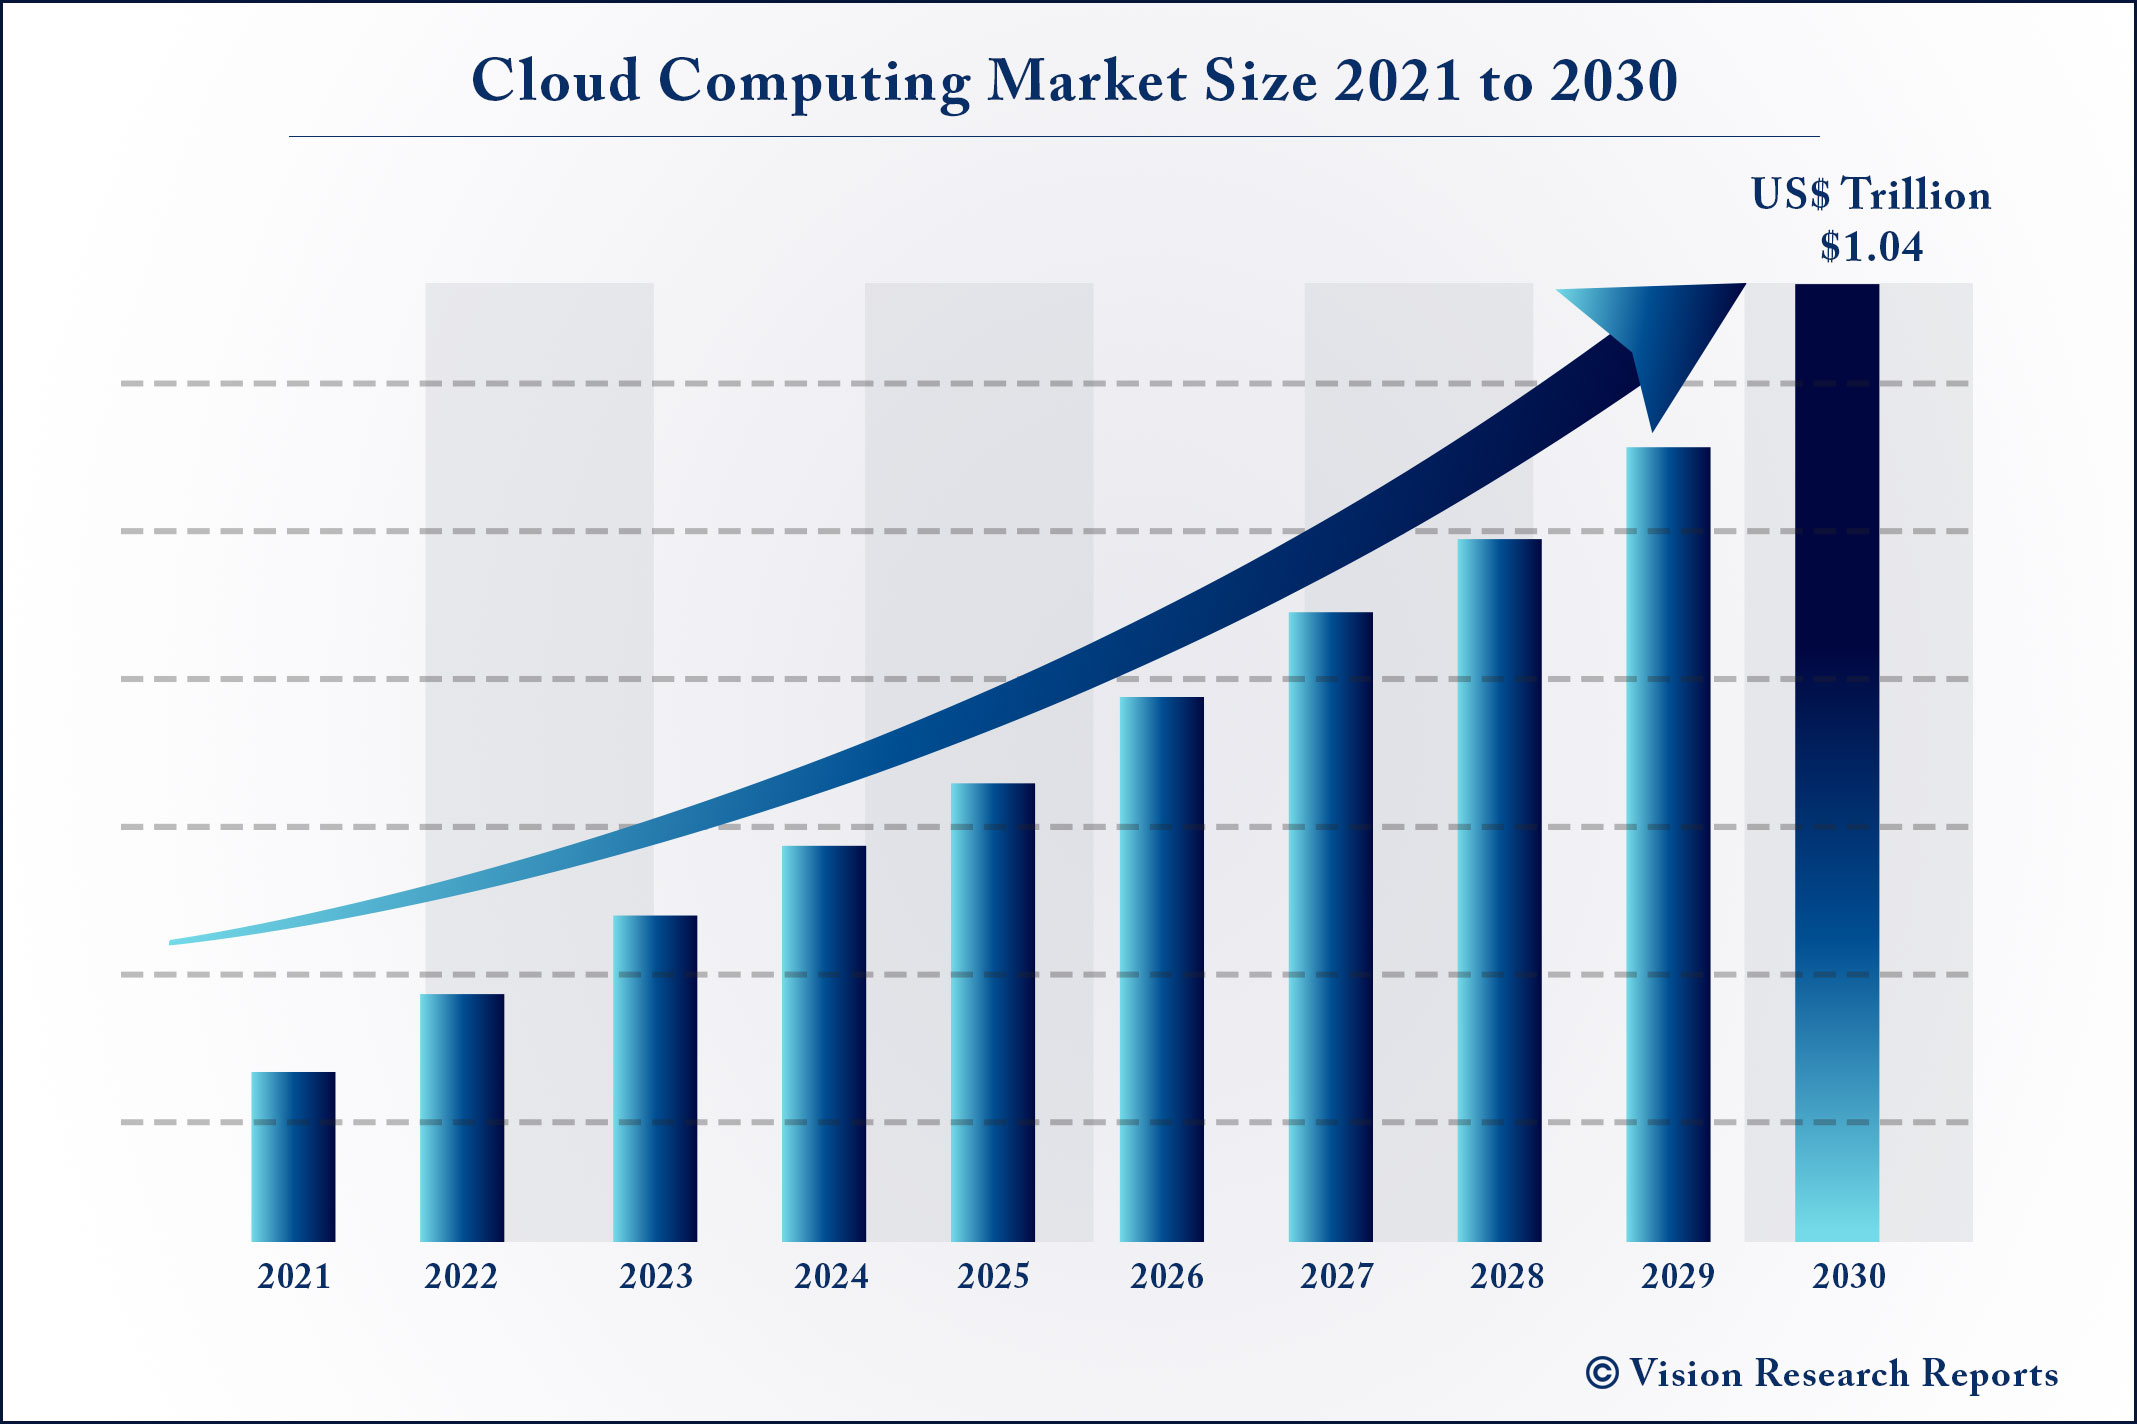 Cloud Computing Market Size 2021 to 2030